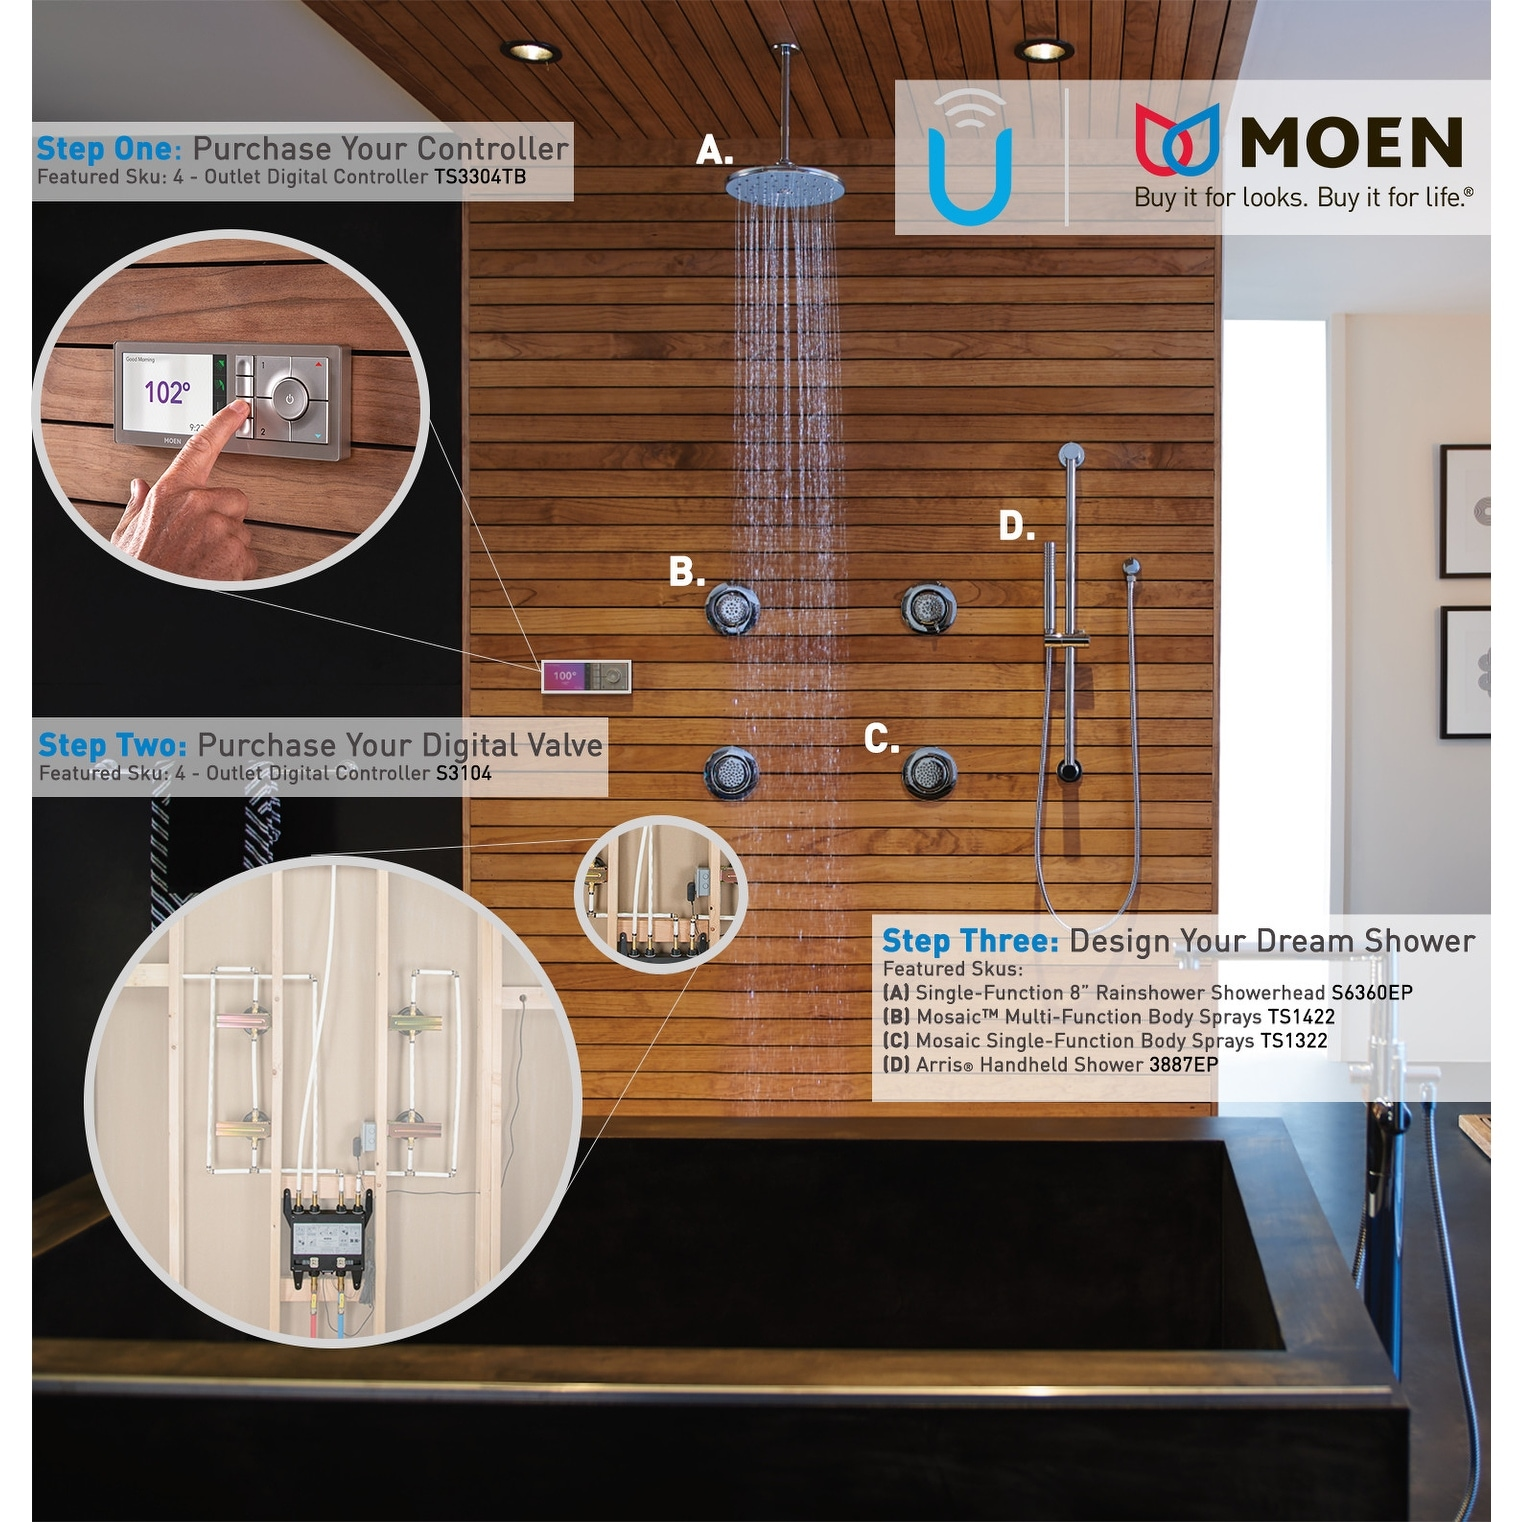 Moen S3102 U by Moen Digital Thermostatic Shower 2 Port Valve with 1/2